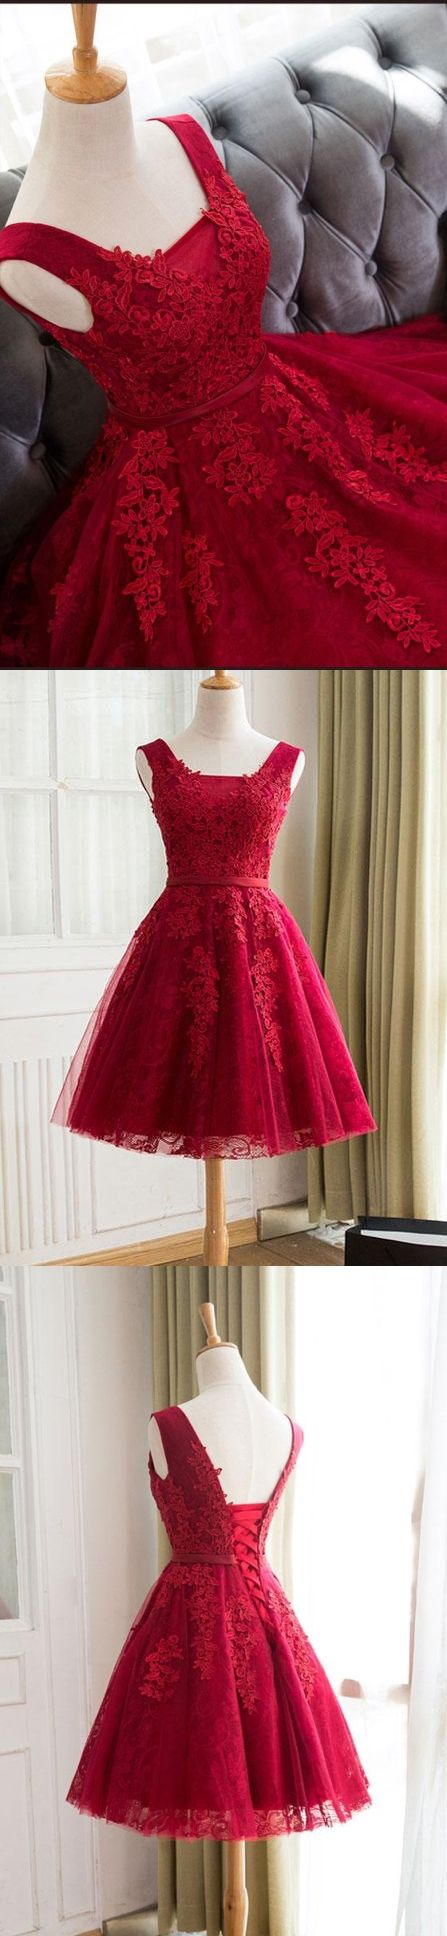 Burgundy homecoming dress straps aline lace appliques laceup short